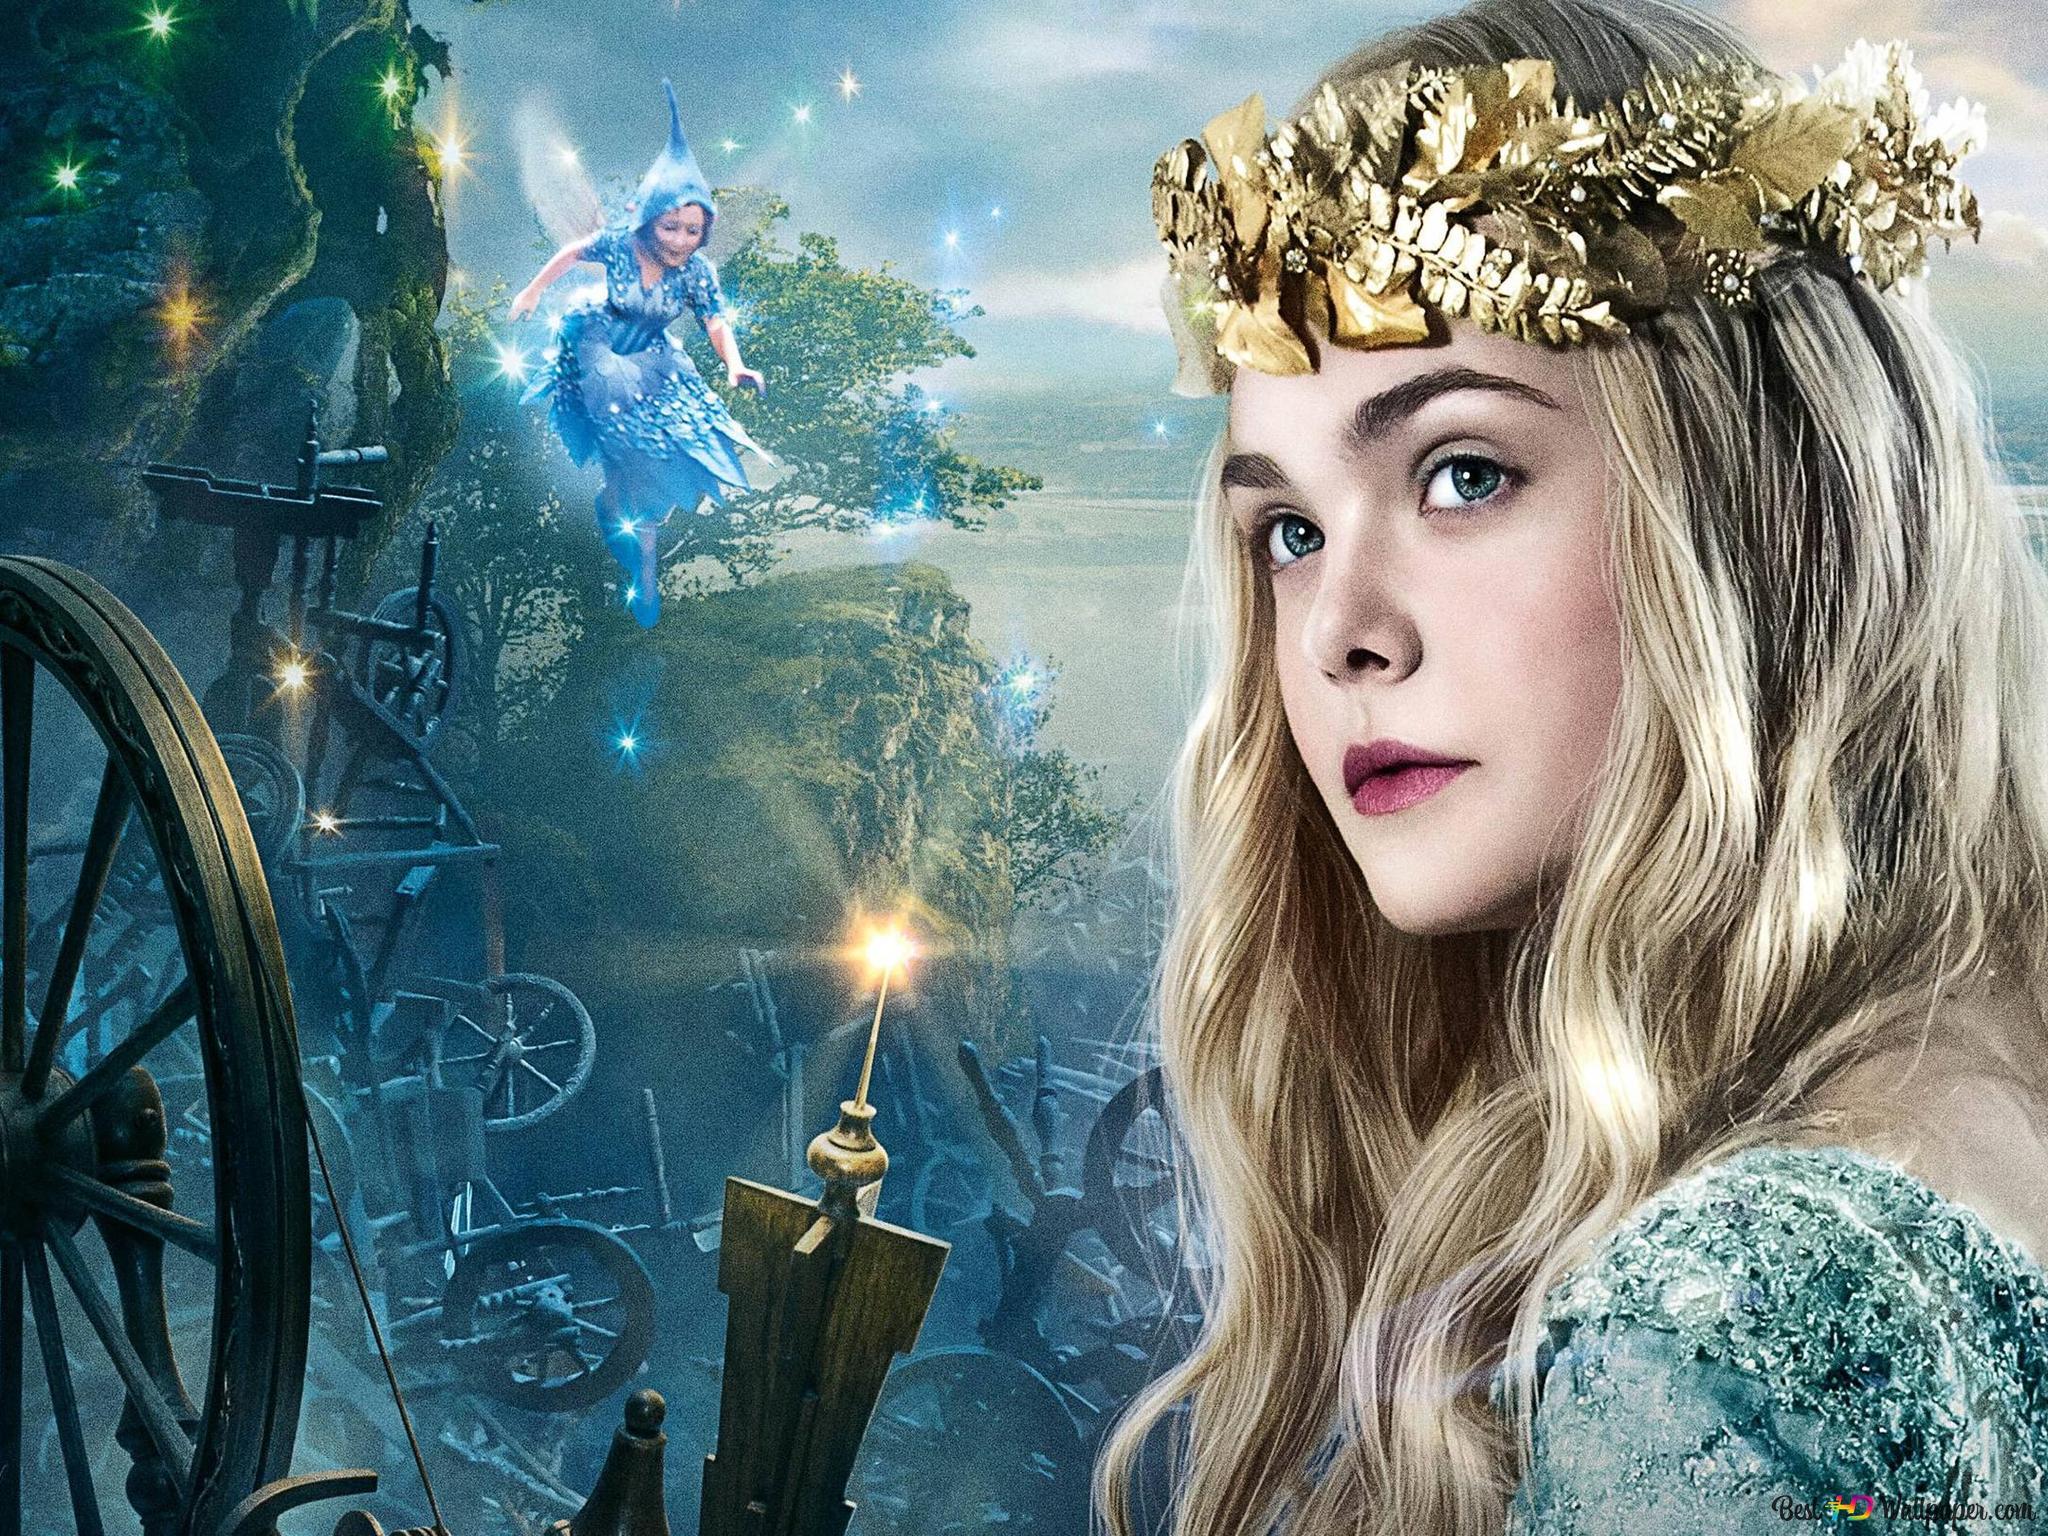 Elle Fanning - Maleficent movie HD wallpaper download